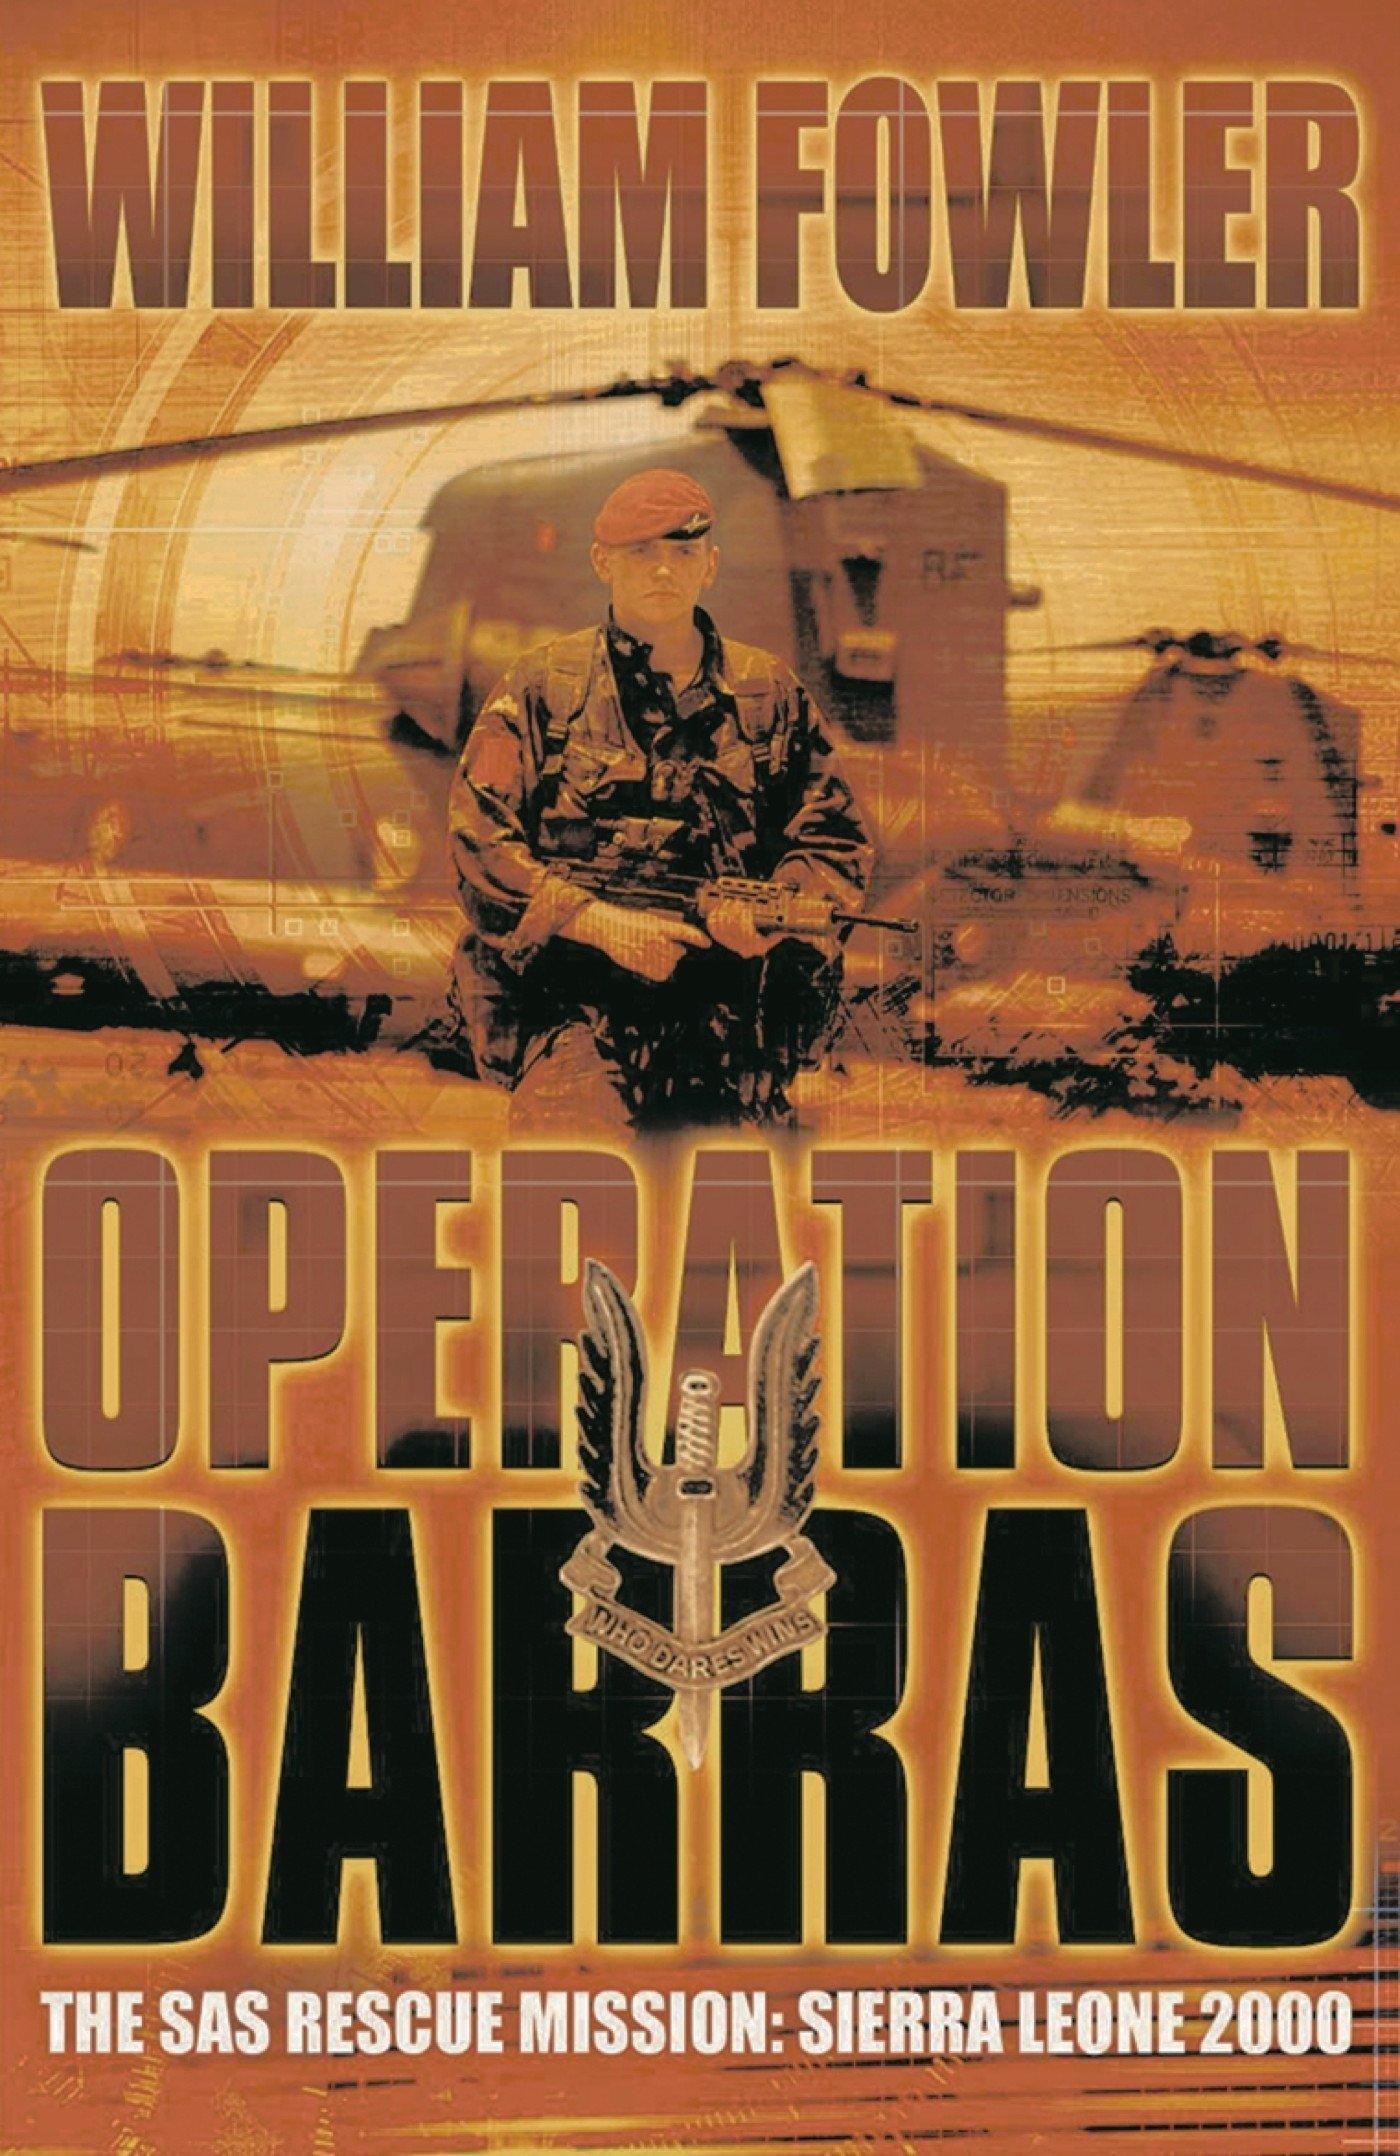 PDF] Operation Barras: The SAS Rescue Mission Sierra Leone 2000 ...